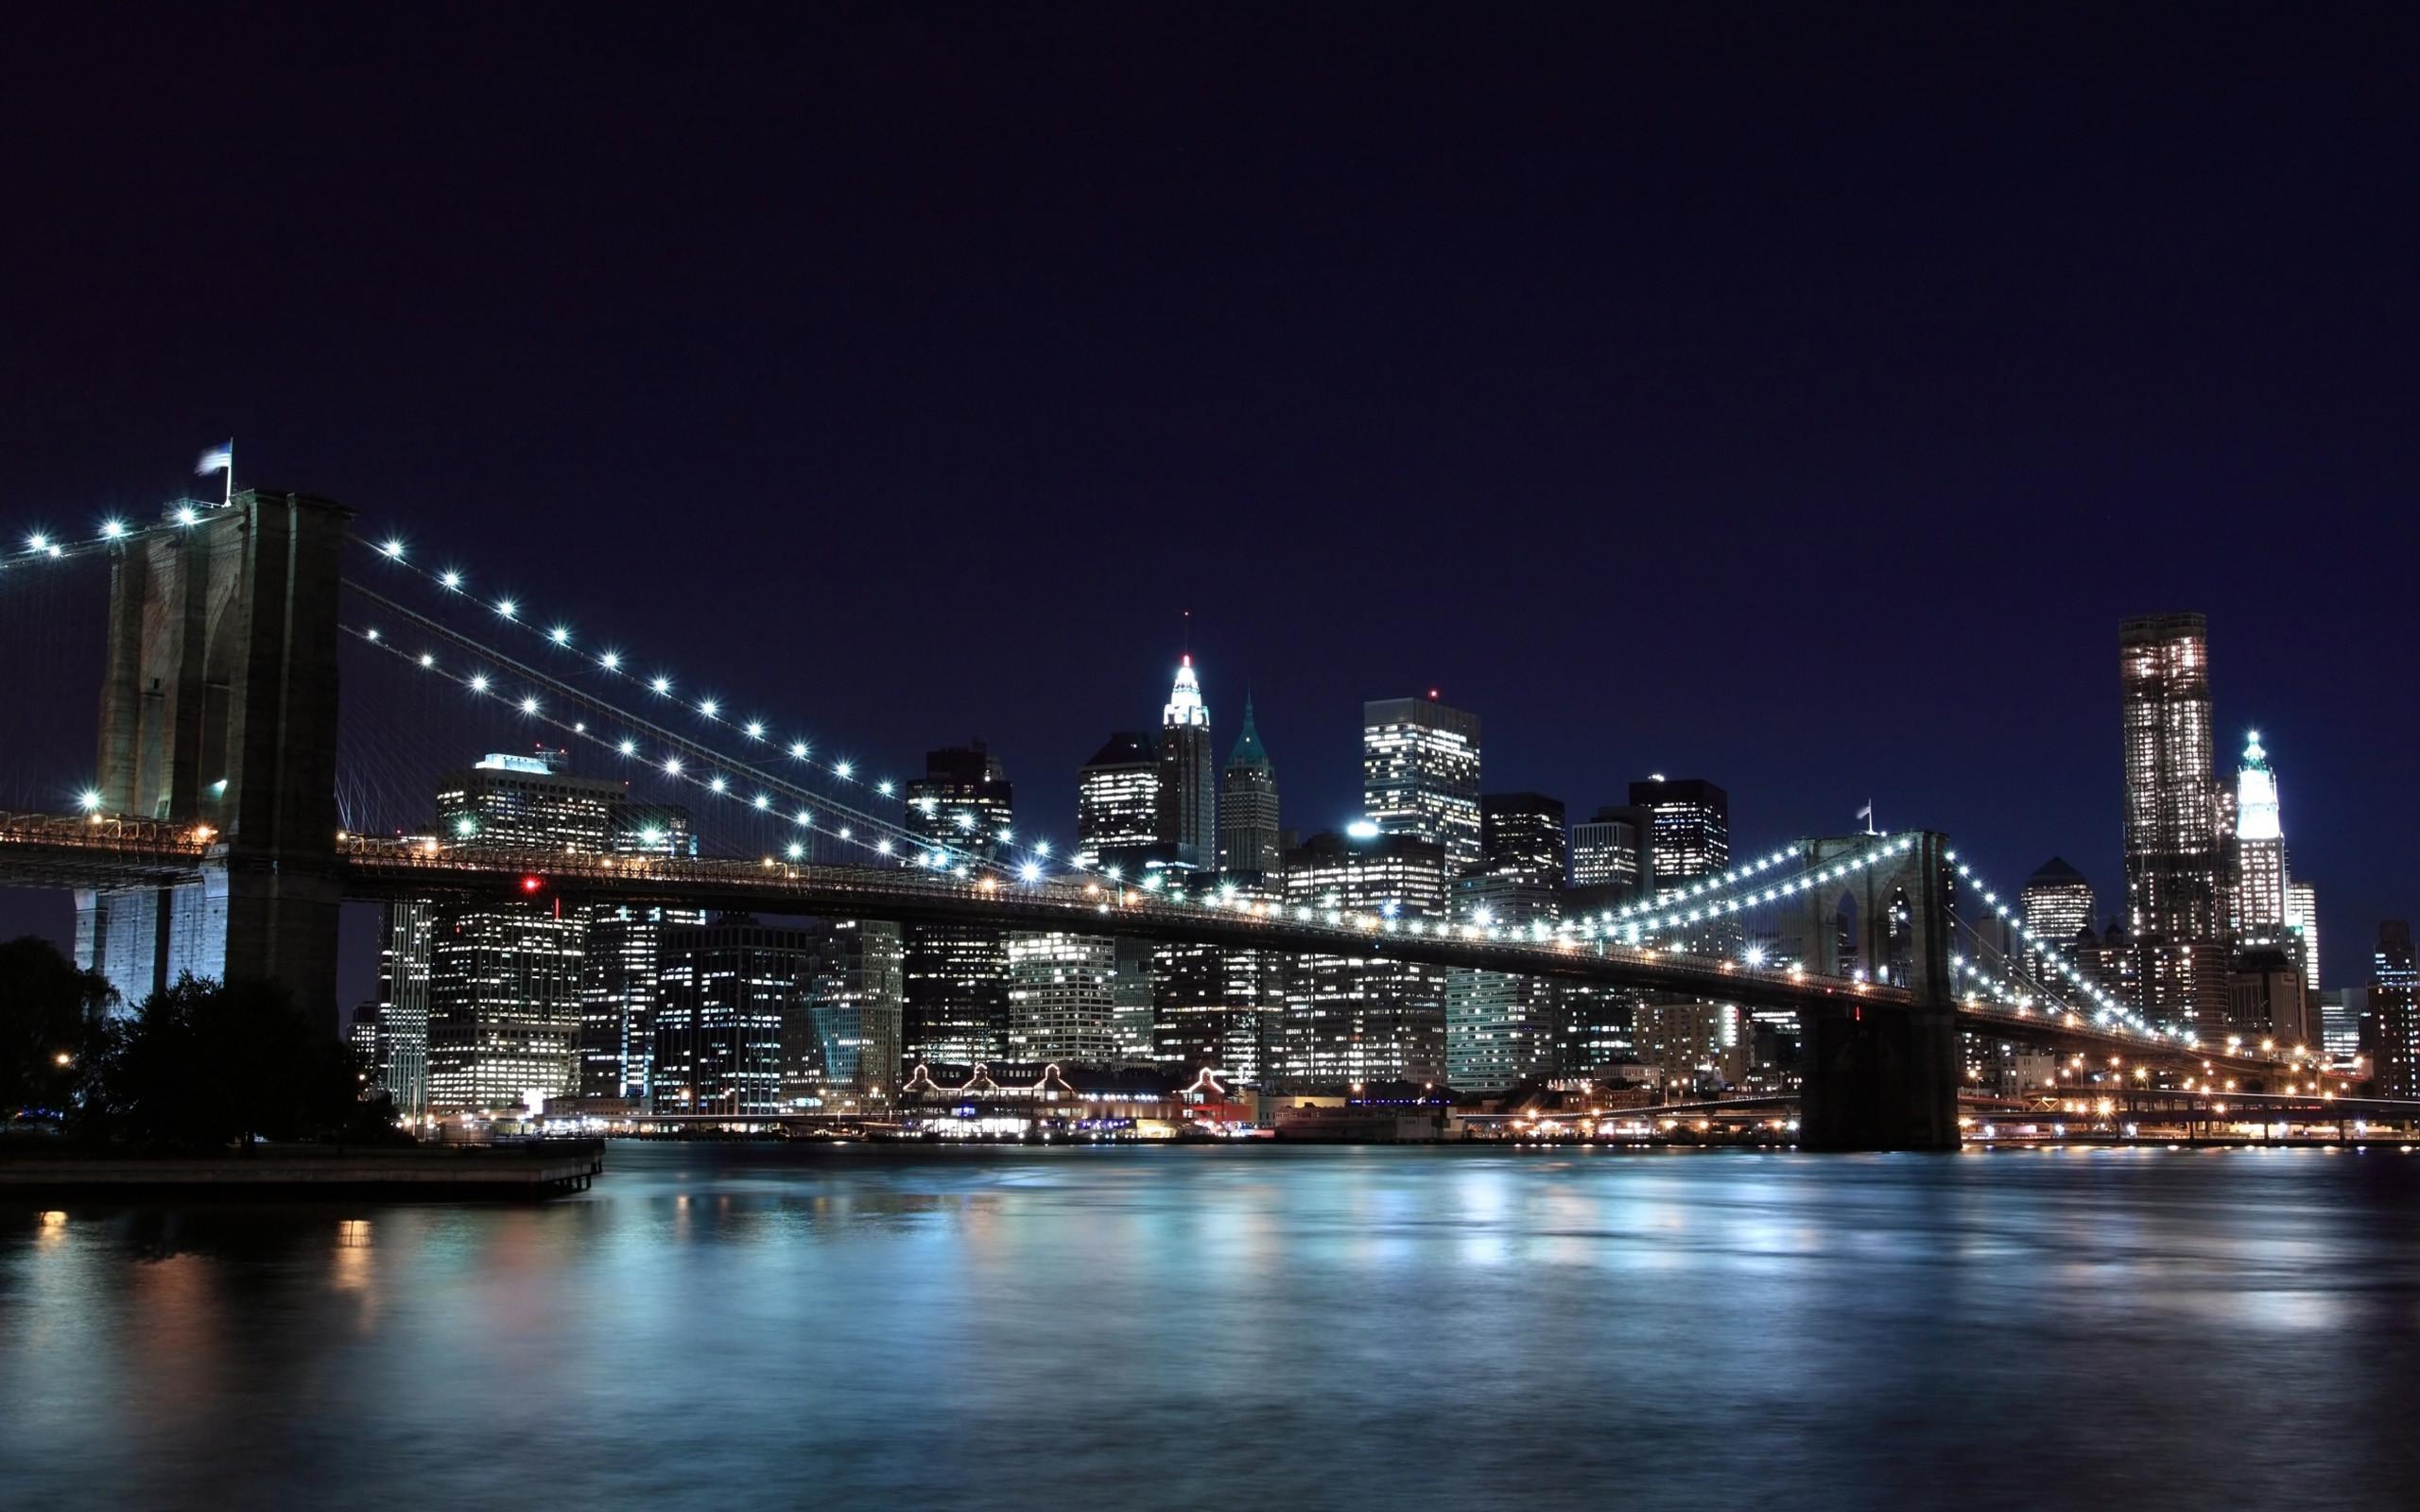 Brooklyn Bridge, Night, New York, USA https://www.walldc